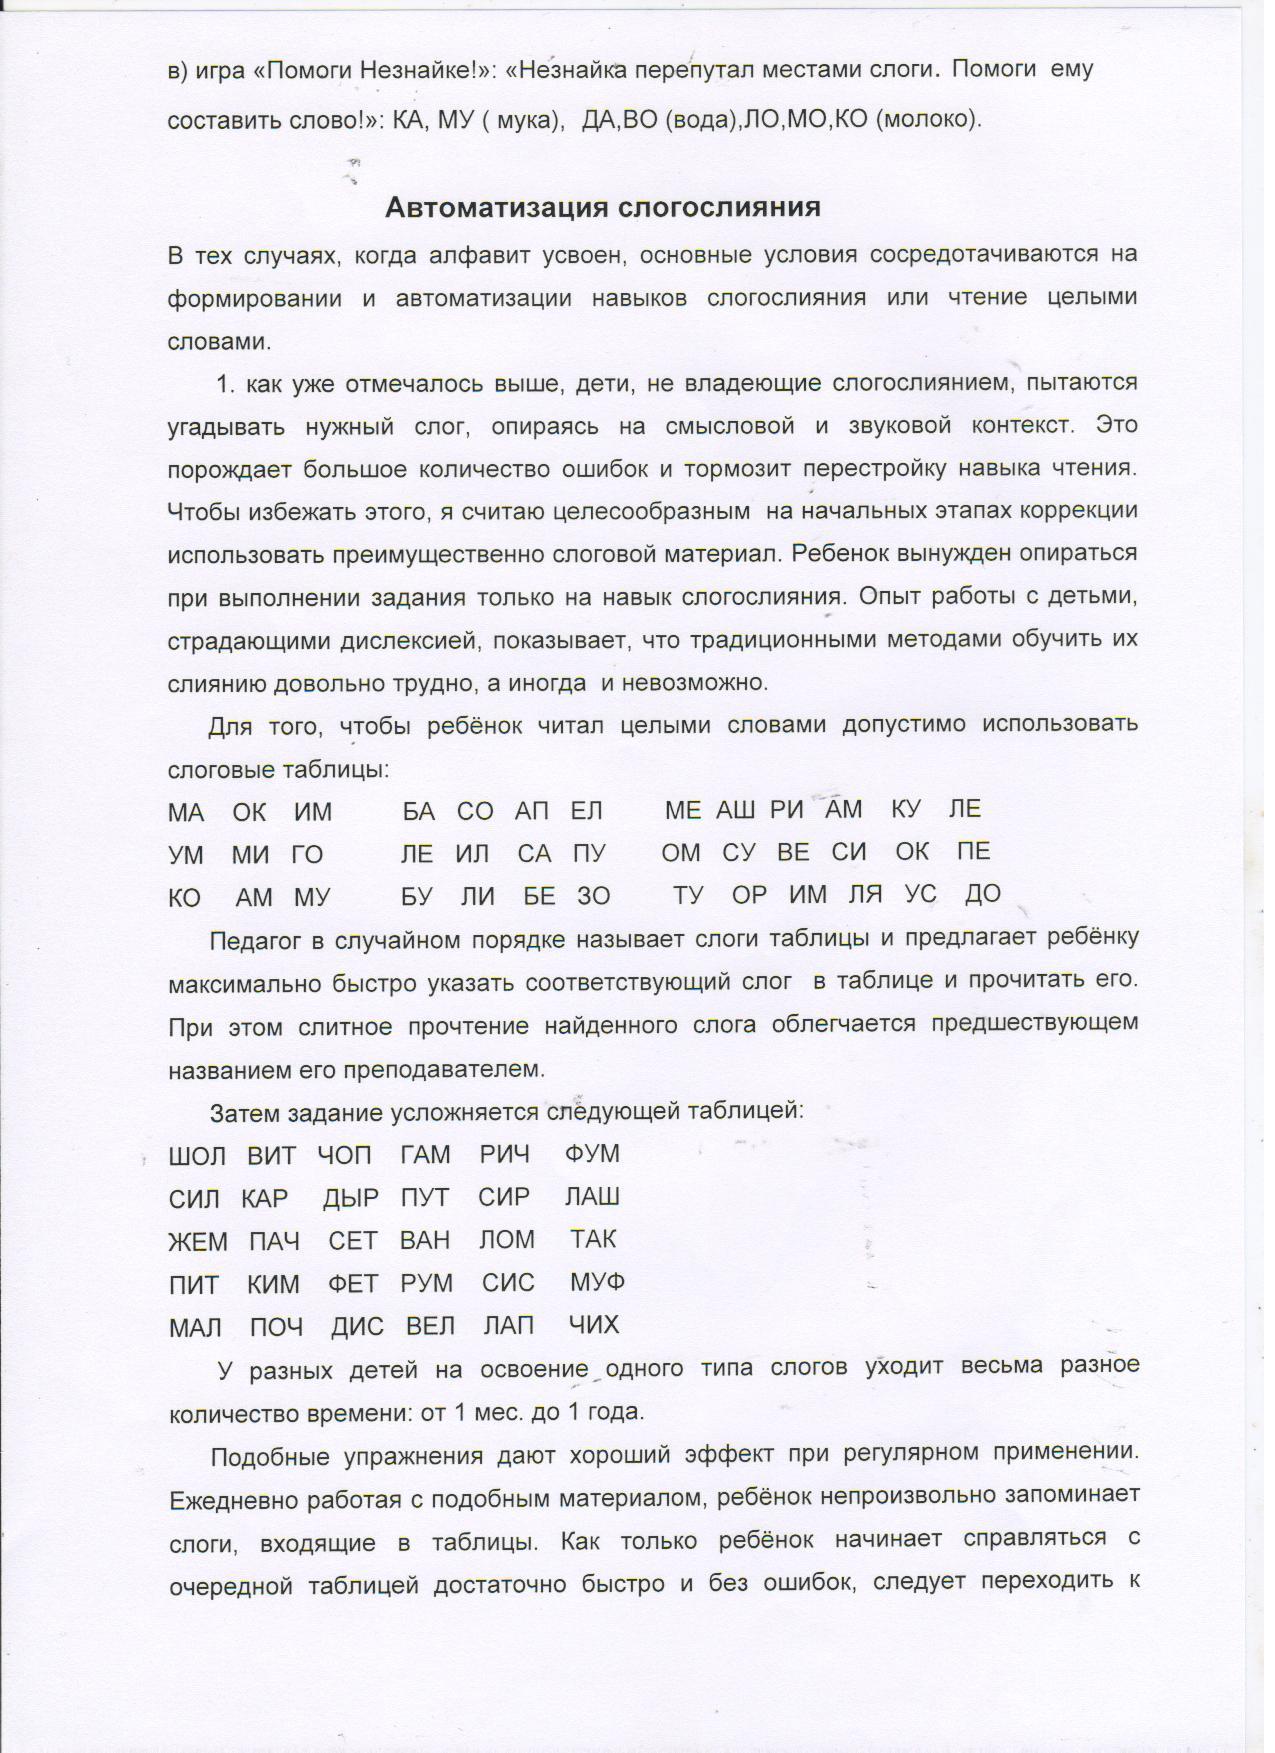 C:\Documents and Settings\Администратор\Рабочий стол\Тептякова Е.А. 008.jpg